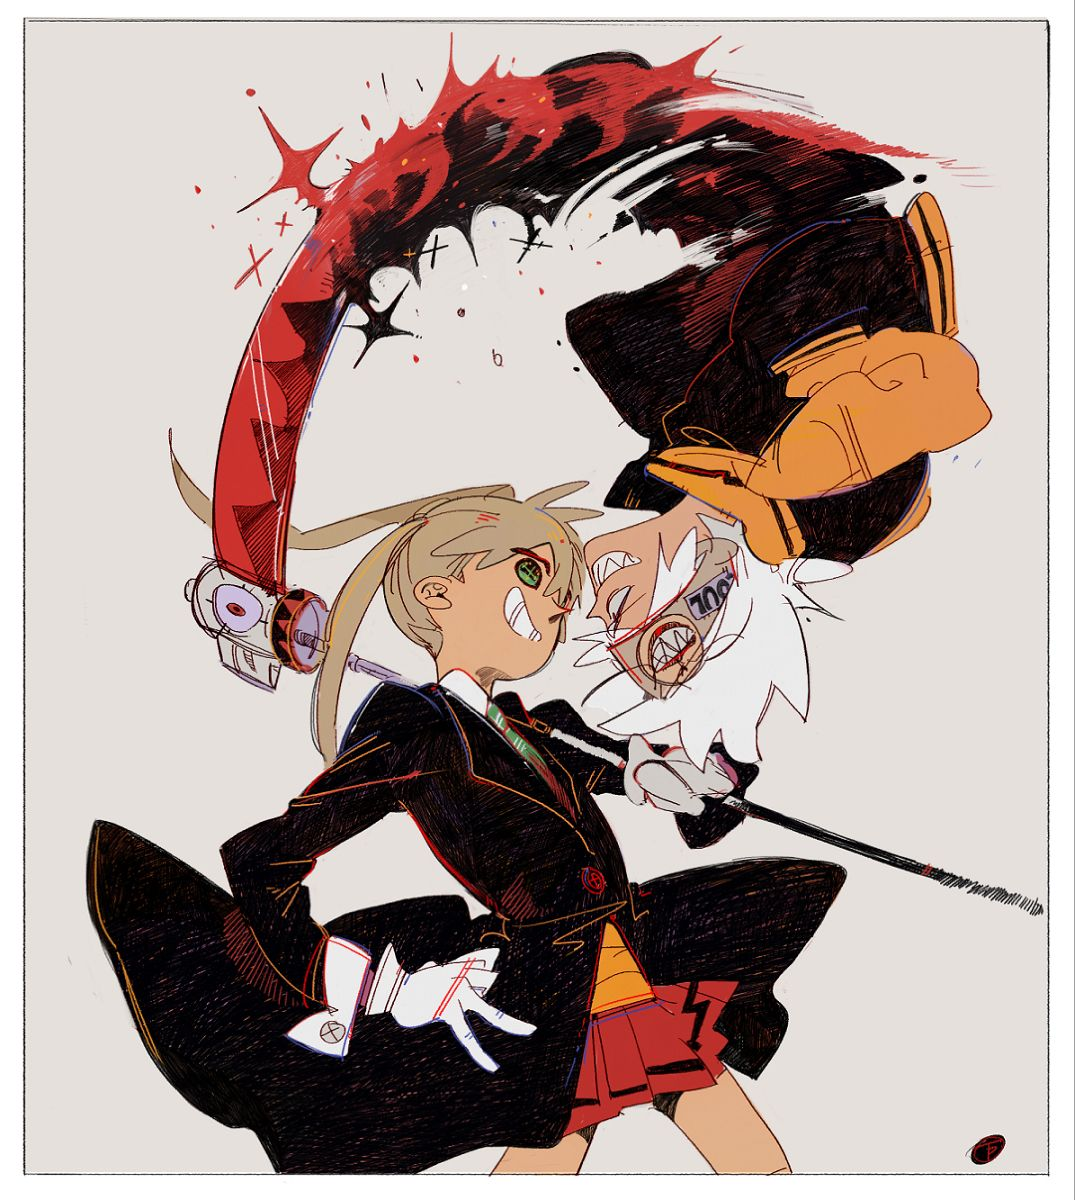 Idea By Caro On Soul Eater In 2020 Anime Soul Soul Eater Soul